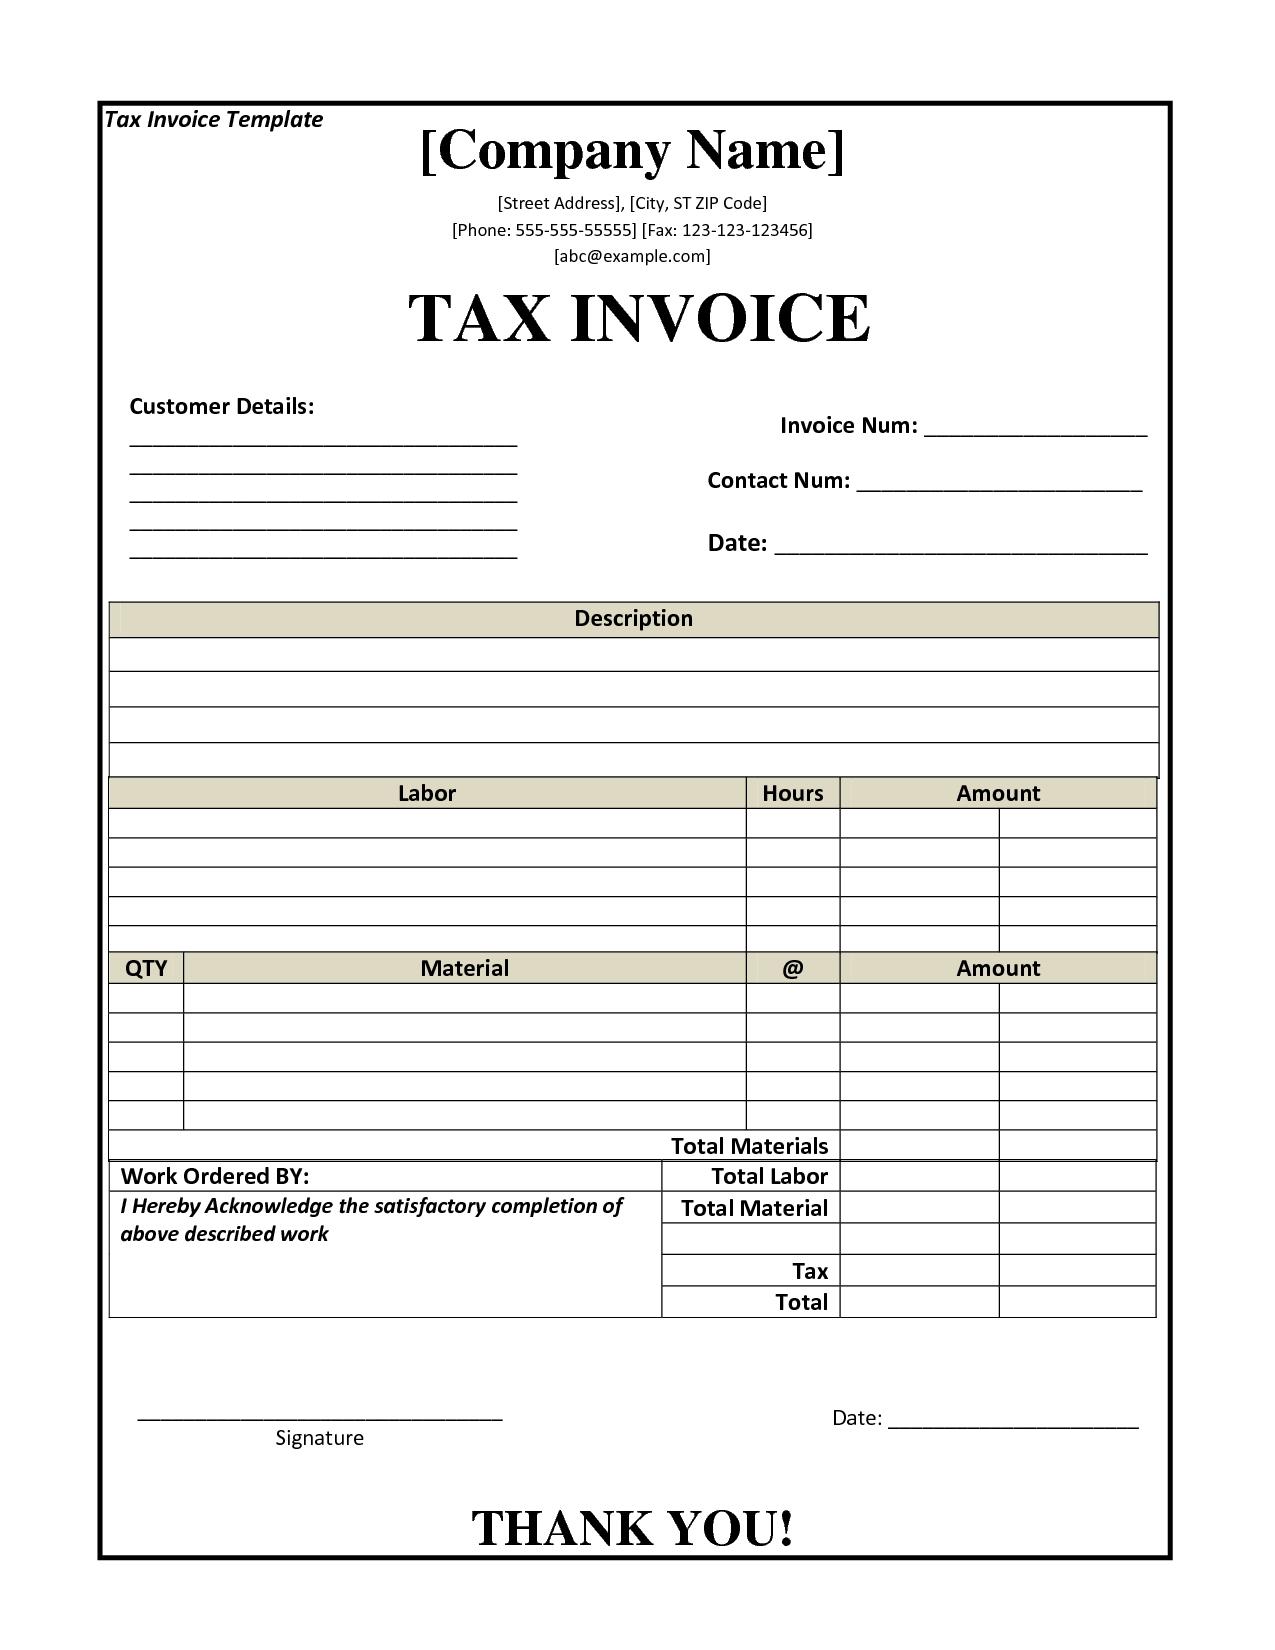 tax invoice template nz invoice template 2017 nz tax invoice template